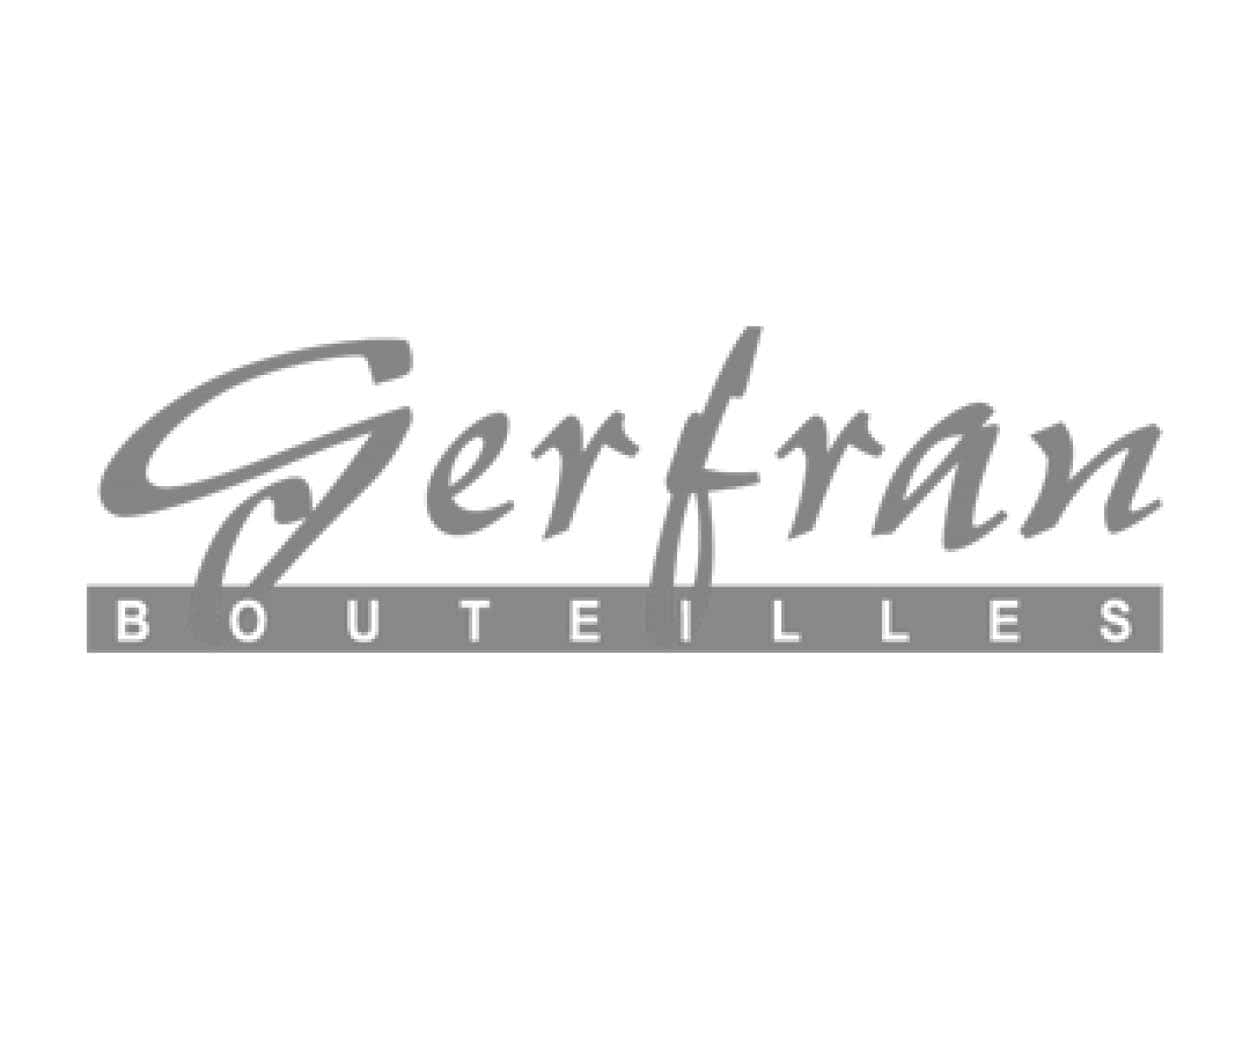 Gerfran